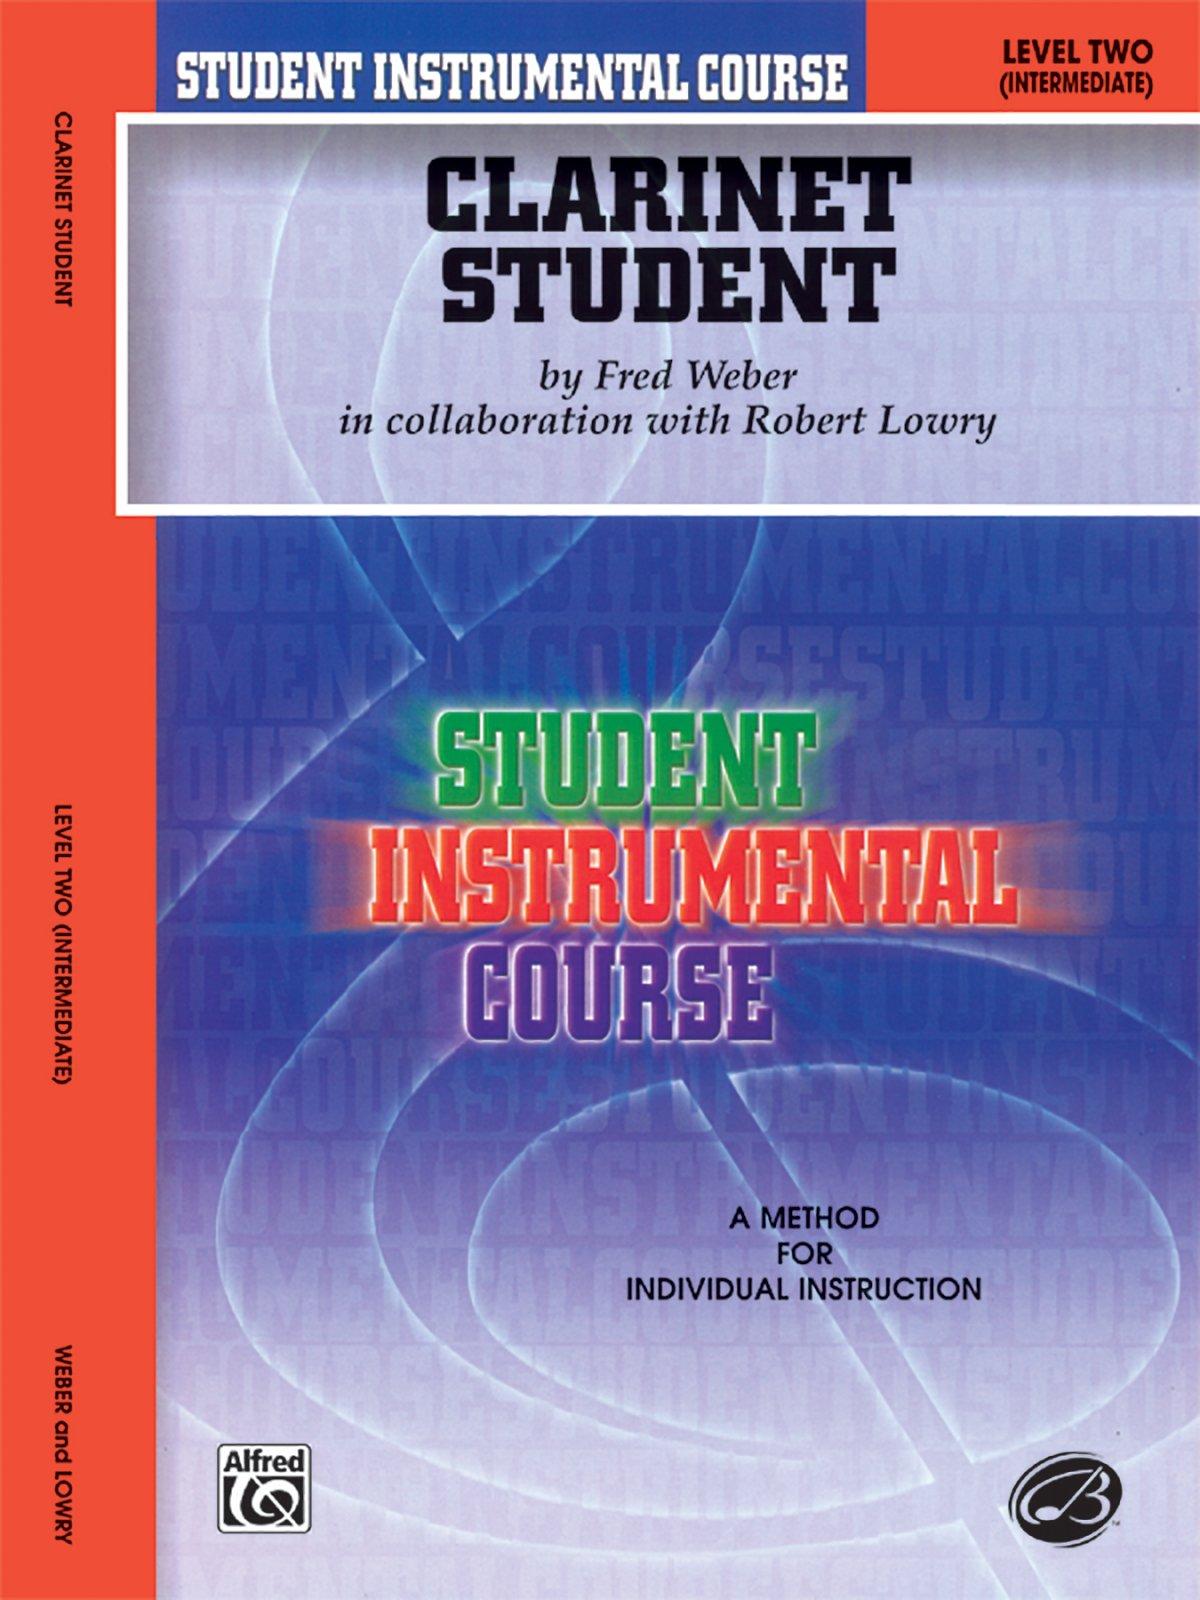 Student Instrumental Course Clarinet Student: Level II